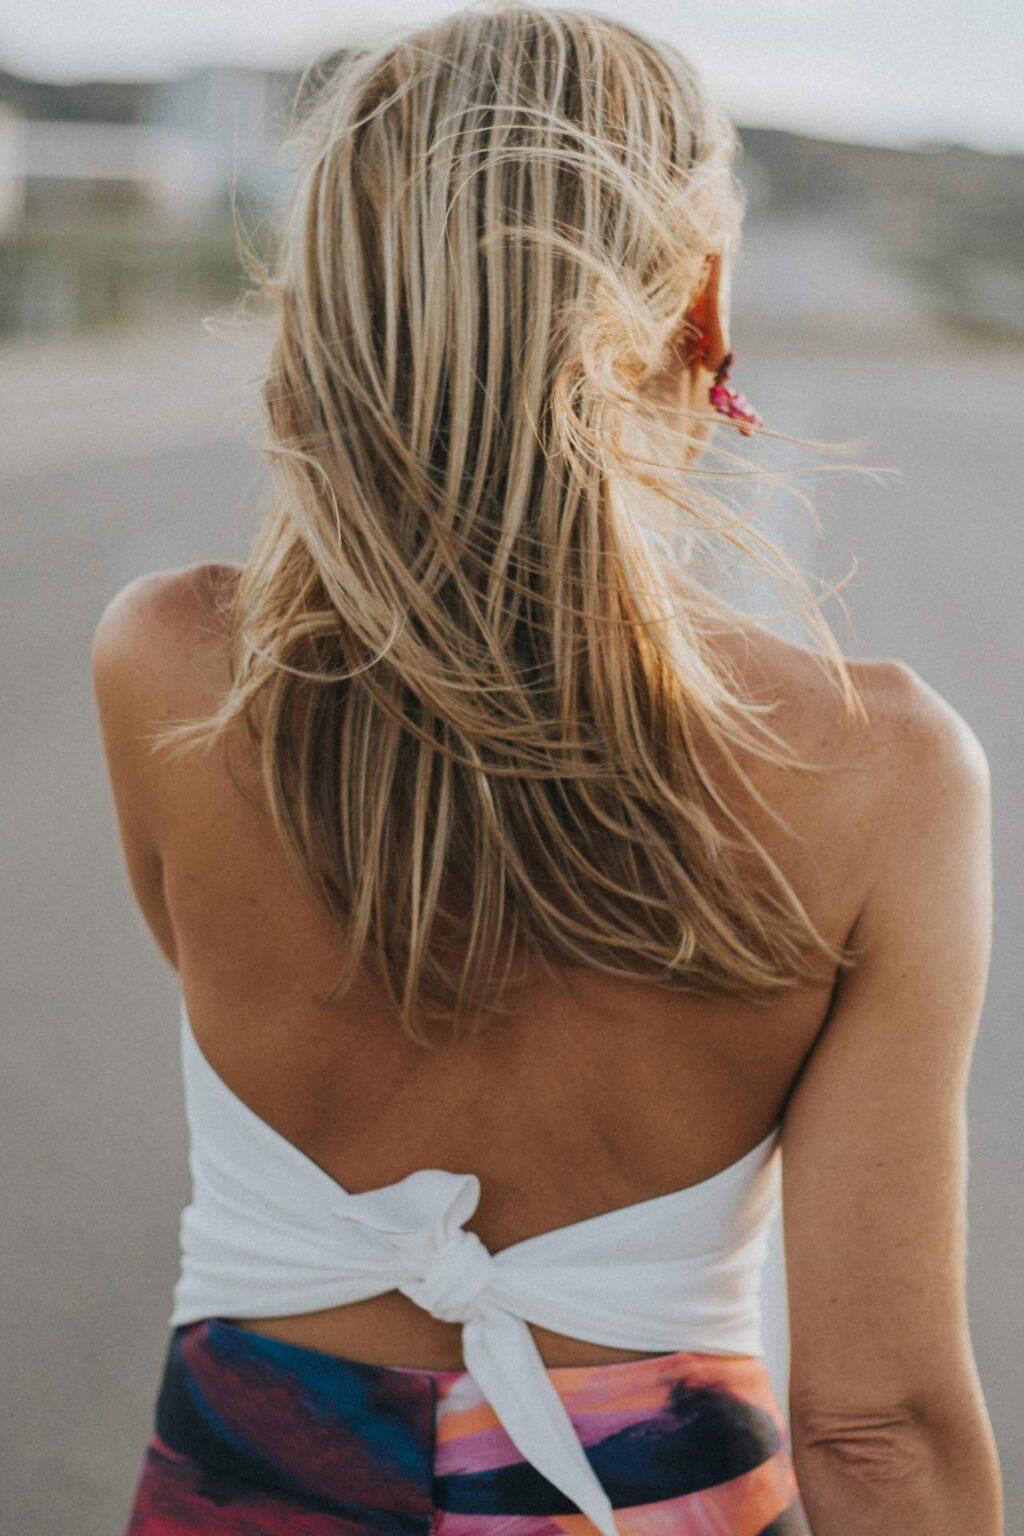 Maldita-Maria-moda-sosteble-cuerpo-triangulo-crudo-espalda